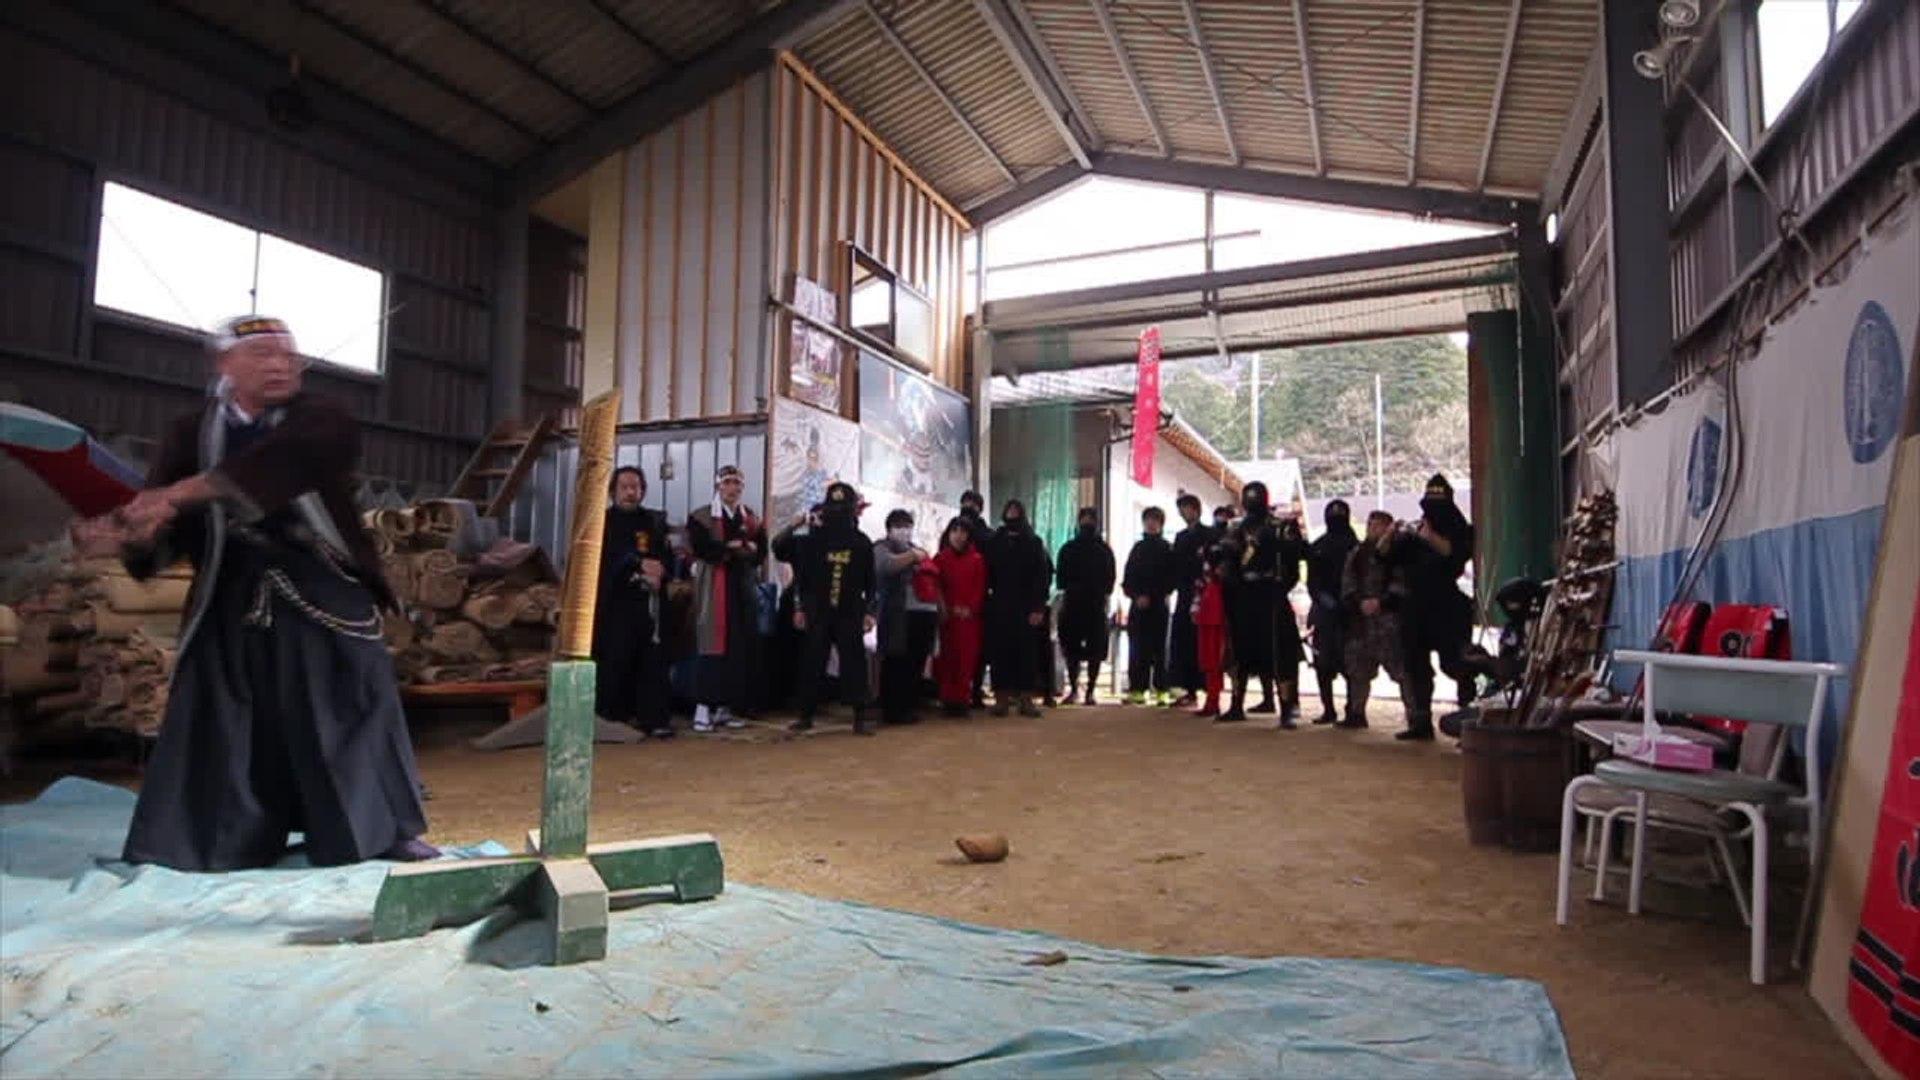 The Ancient Ninja Arts Survive at the Yagu Ninjitsu Academy Dojo